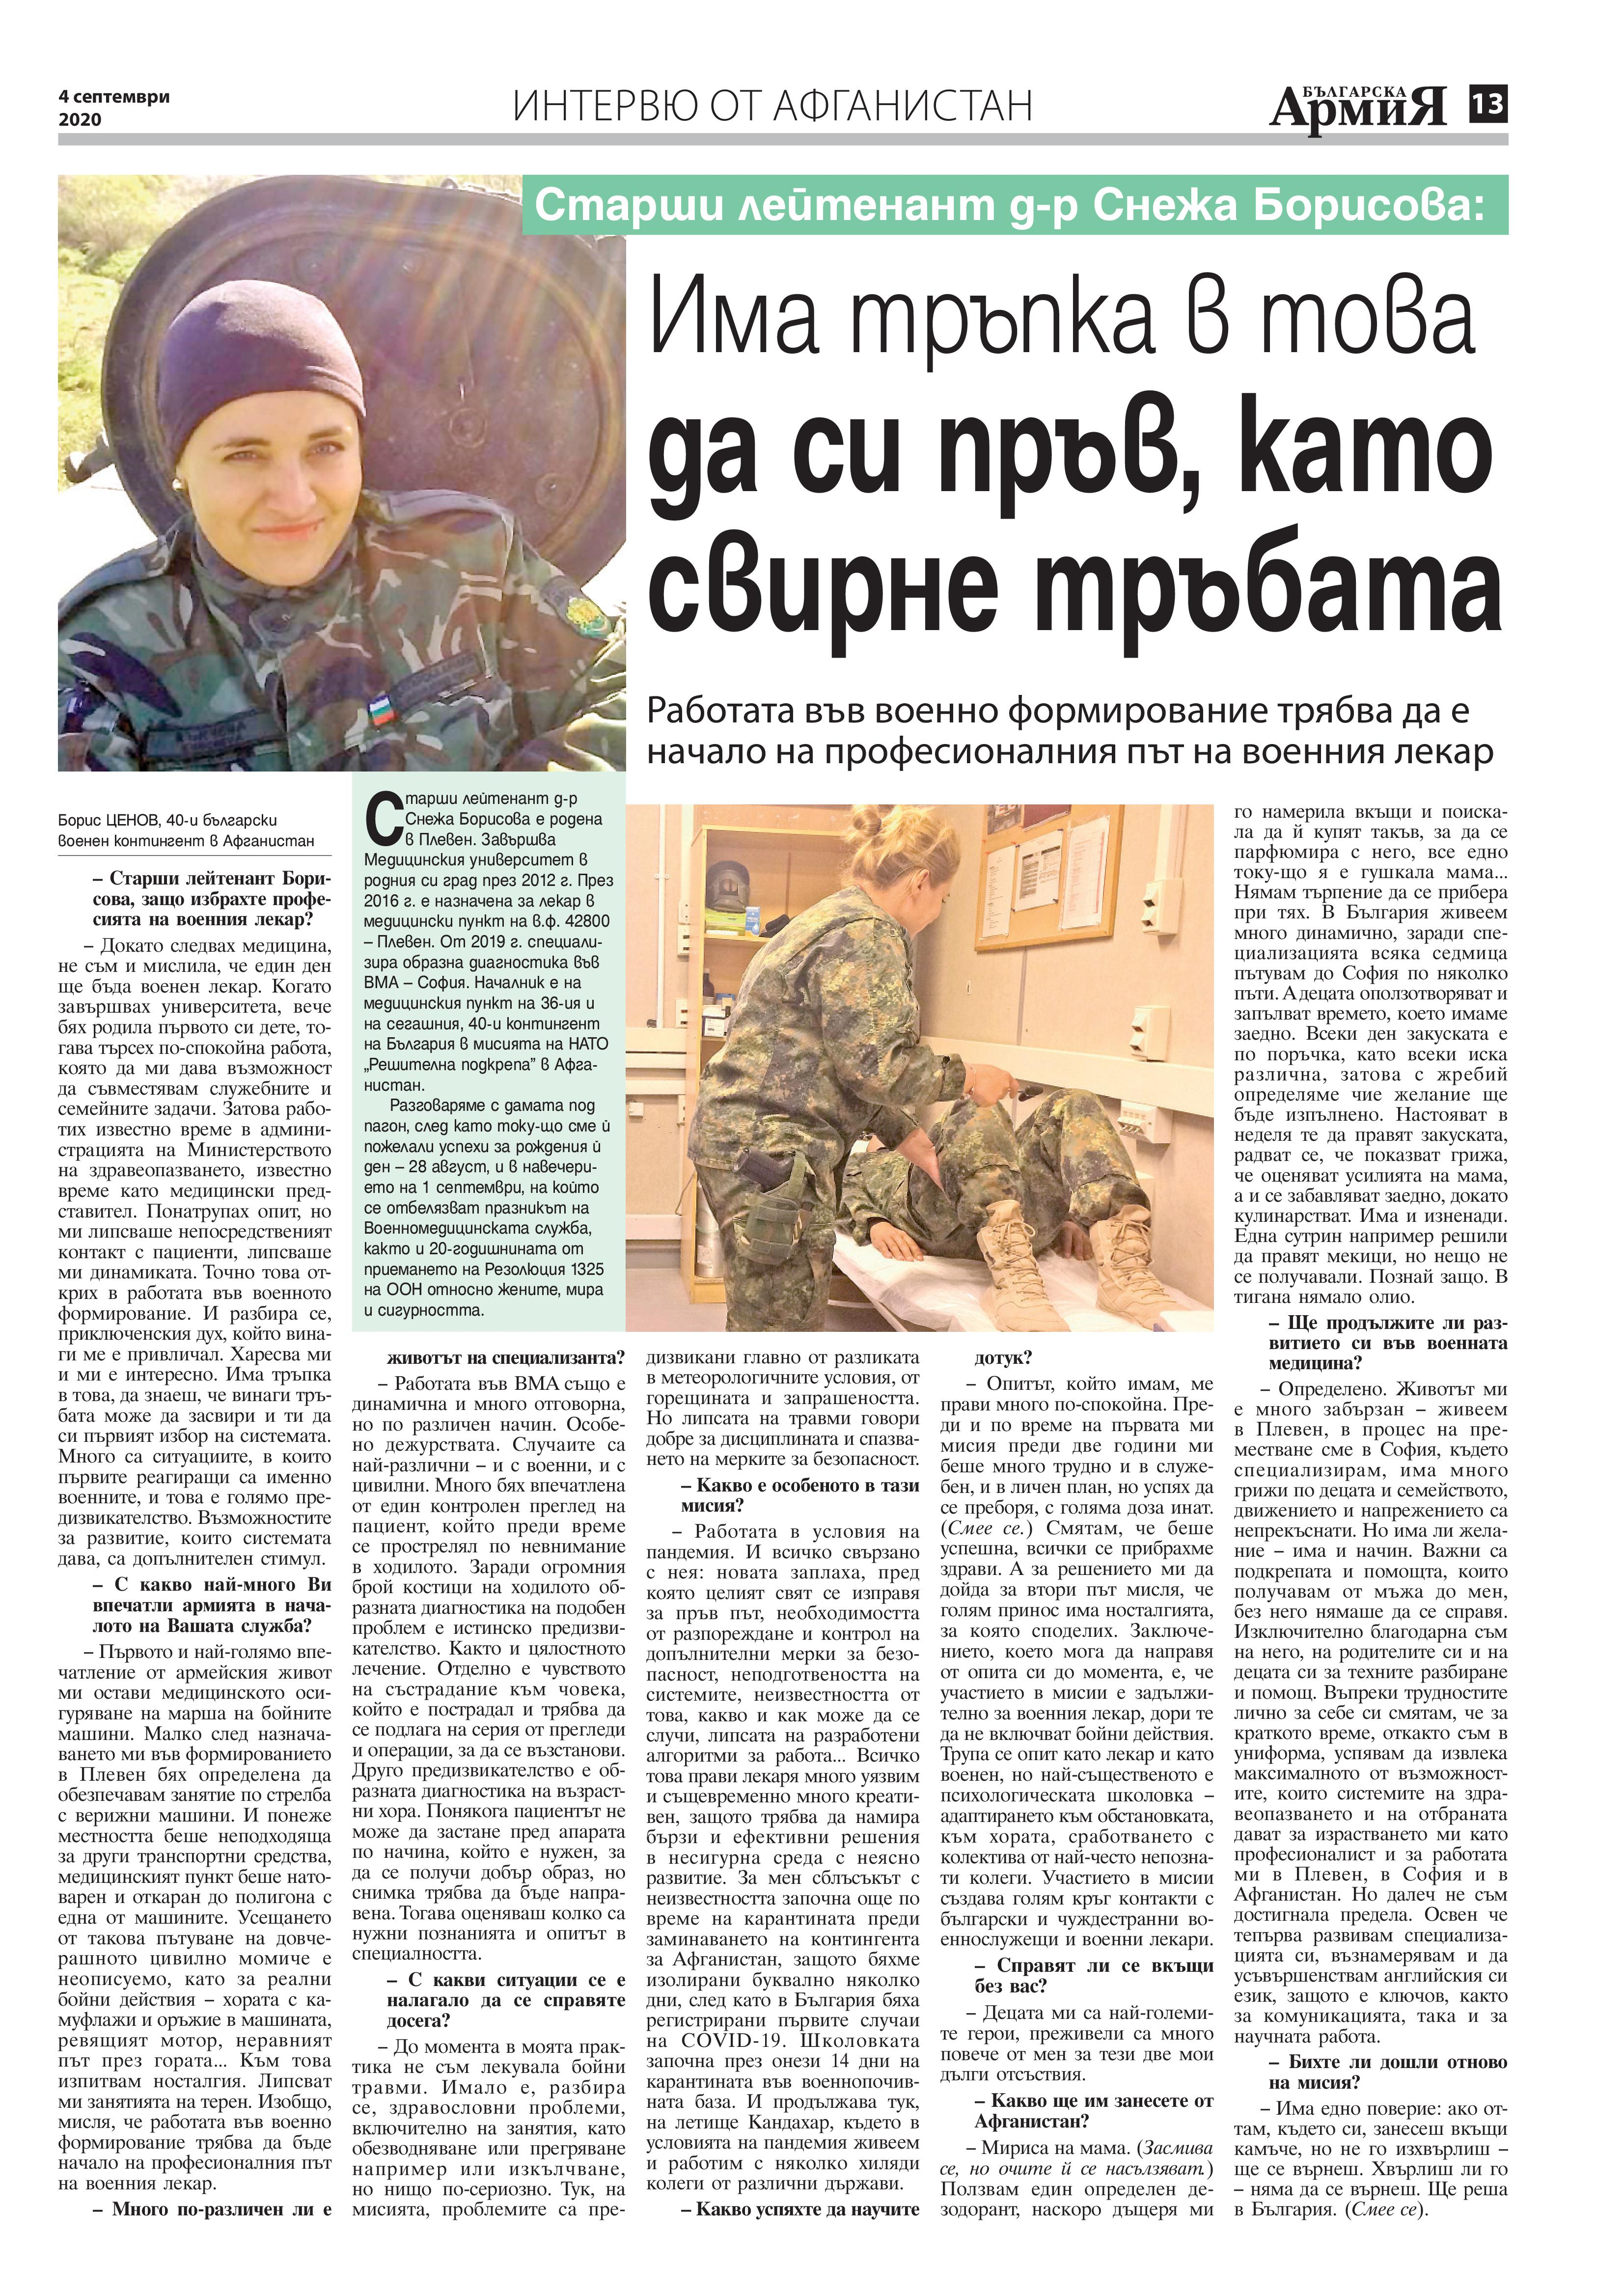 https://www.armymedia.bg/wp-content/uploads/2015/06/13-39.jpg